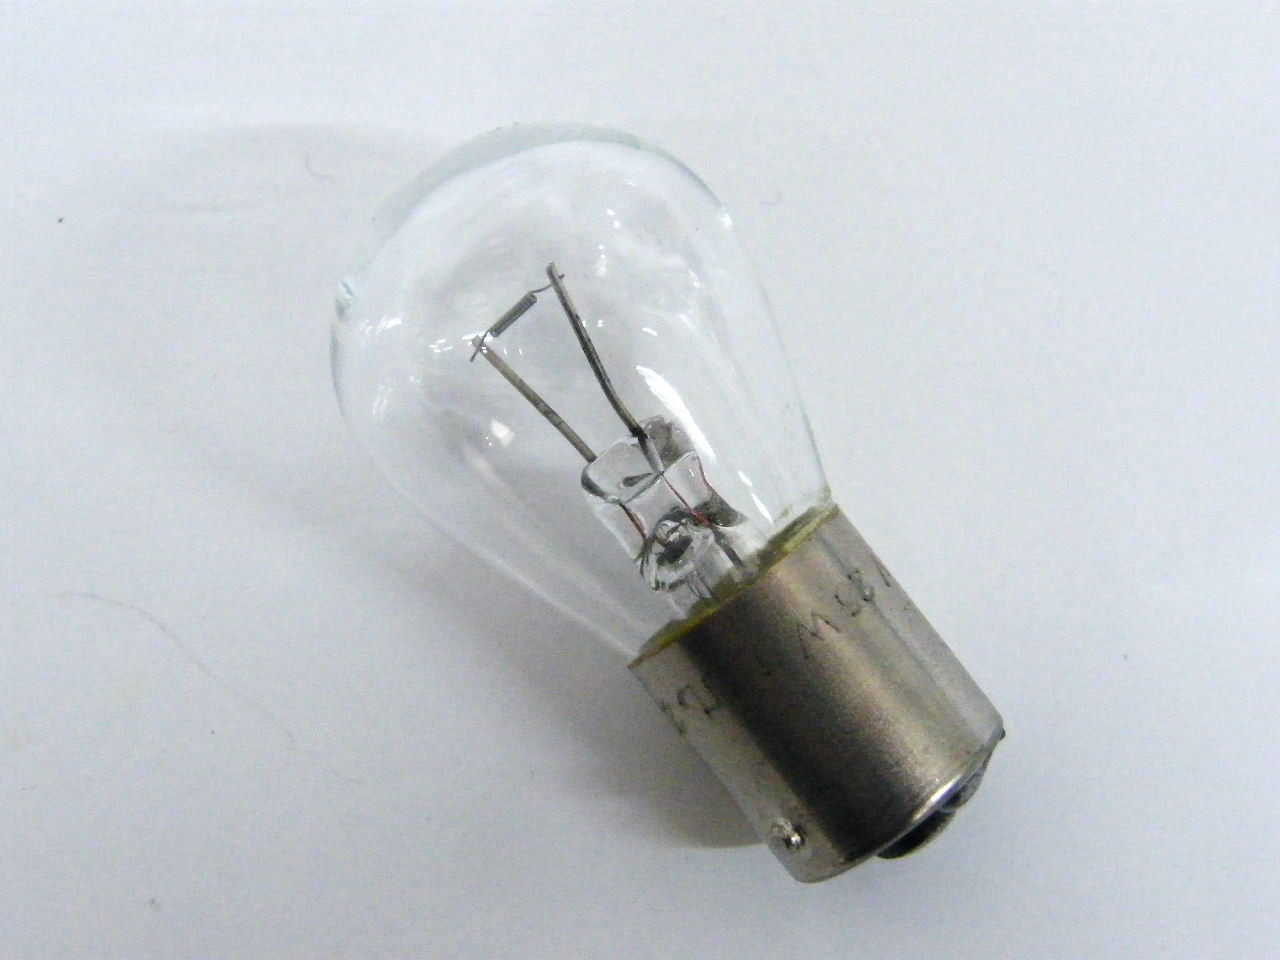 12 Volt Lampen : Glühlampe glühbirne lampe birne volt v w watt ba s